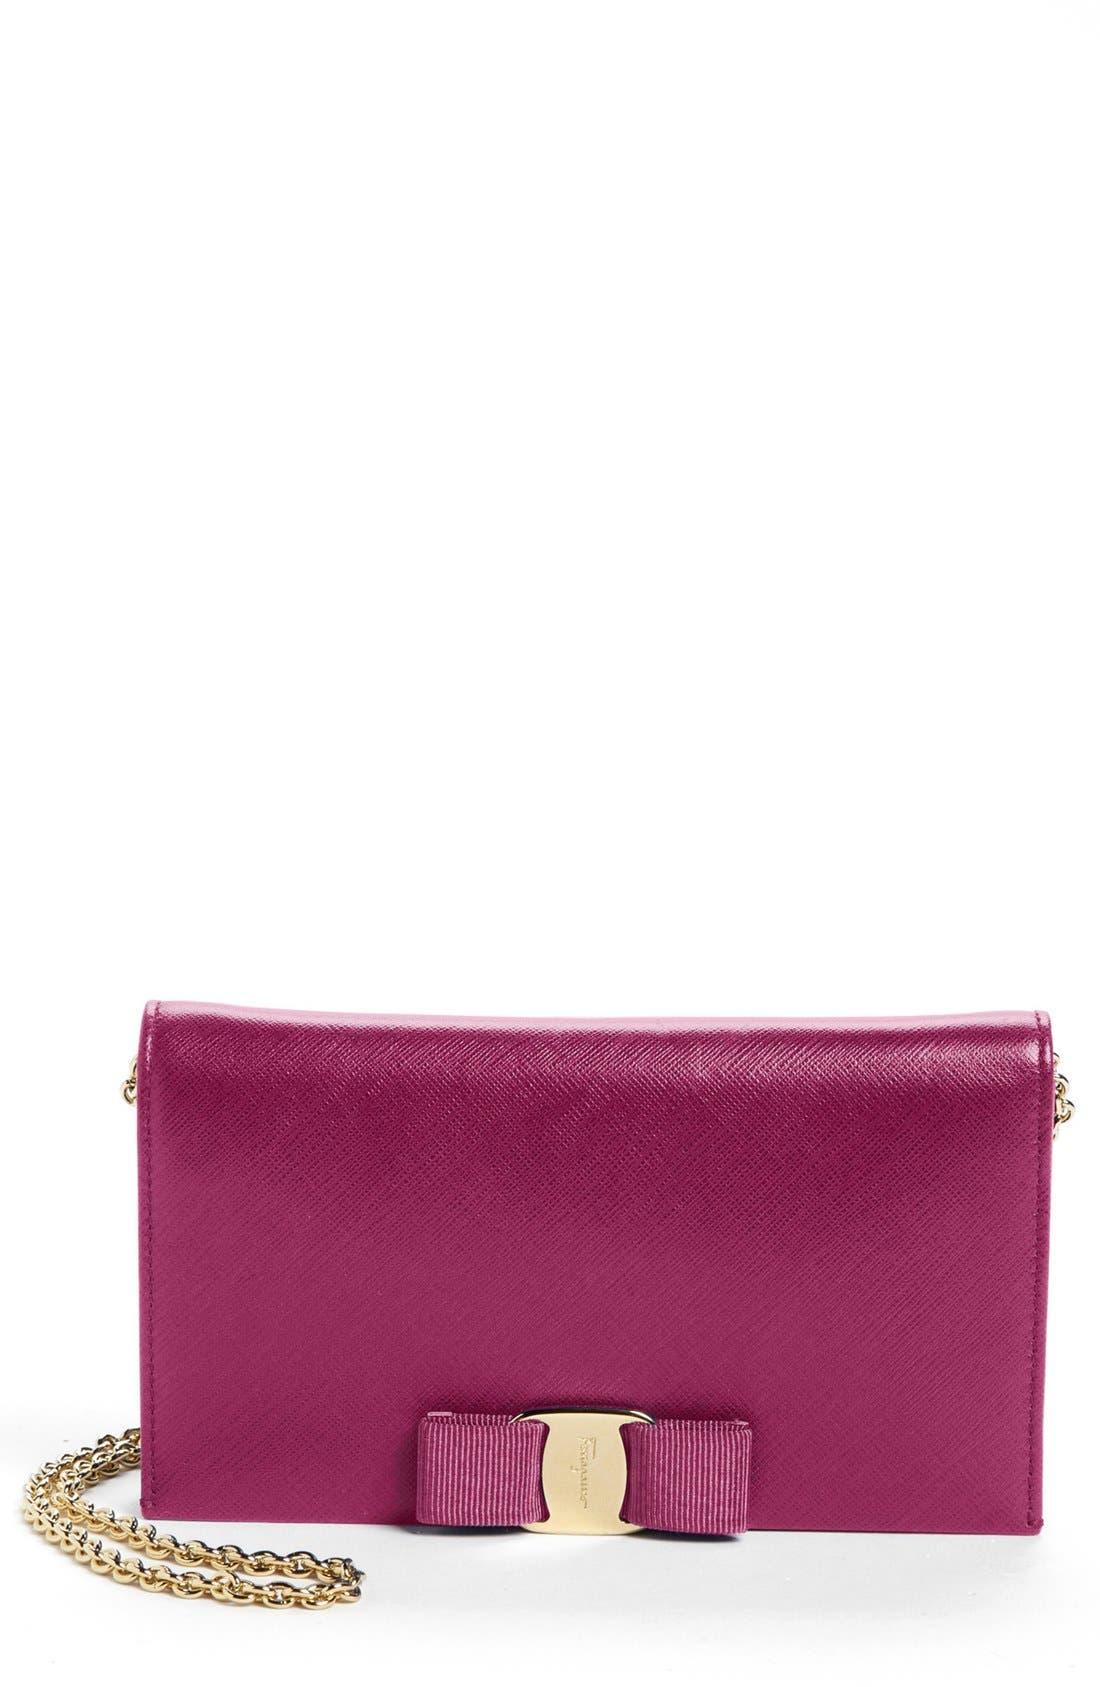 Alternate Image 1 Selected - Salvatore Ferragamo 'Miss Vara' Clutch Wallet